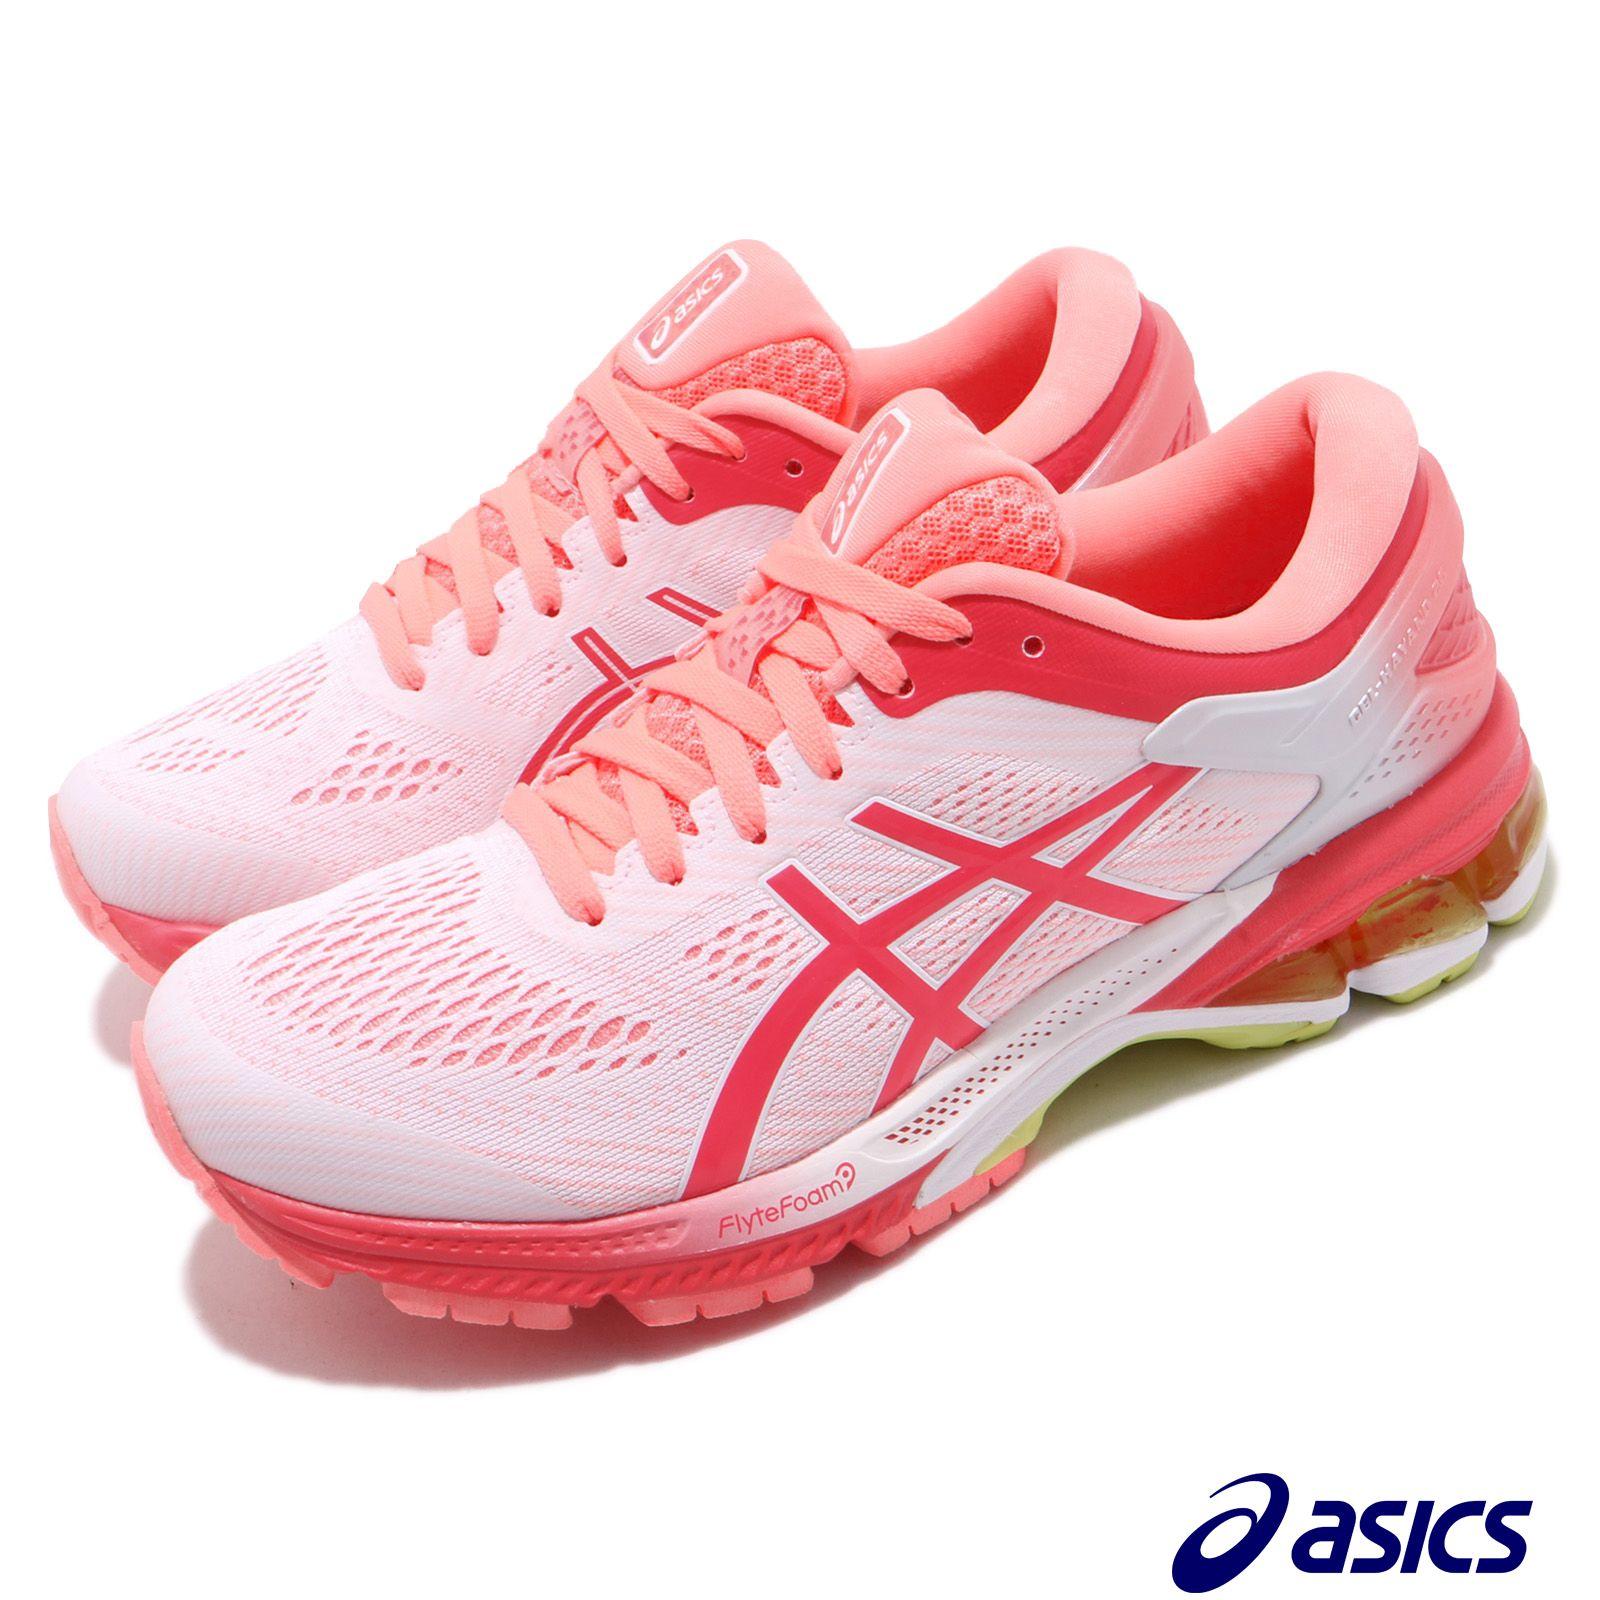 Asics 慢跑鞋 Gel-Kayano 26 運動 女鞋 1012A544100